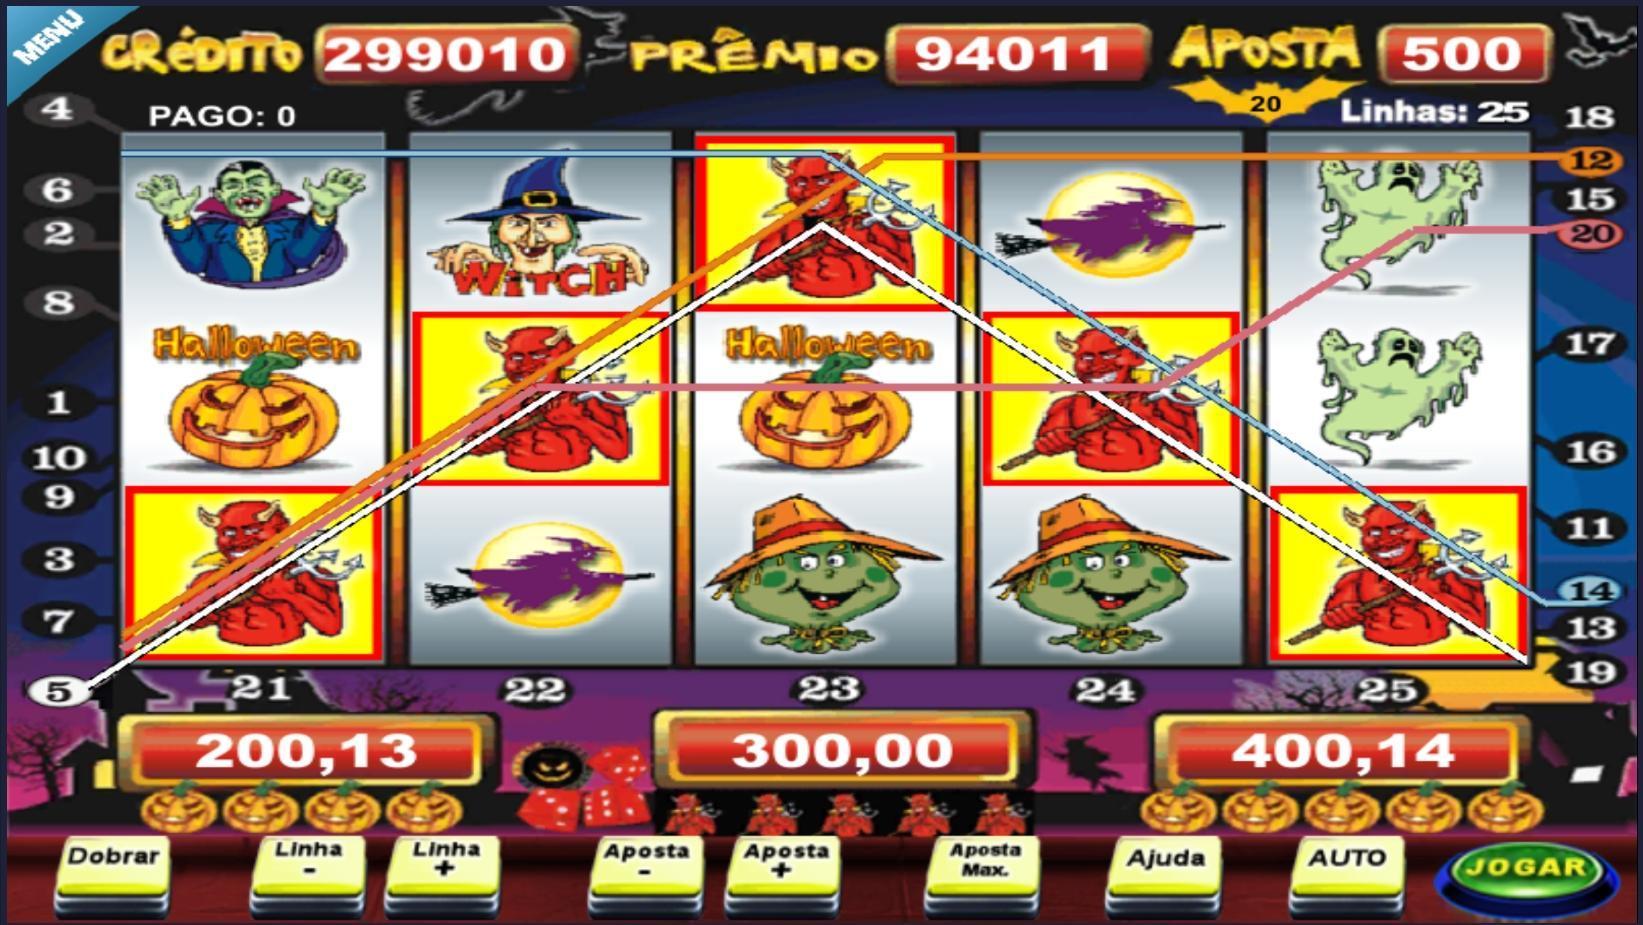 Roku games slot caça 134693